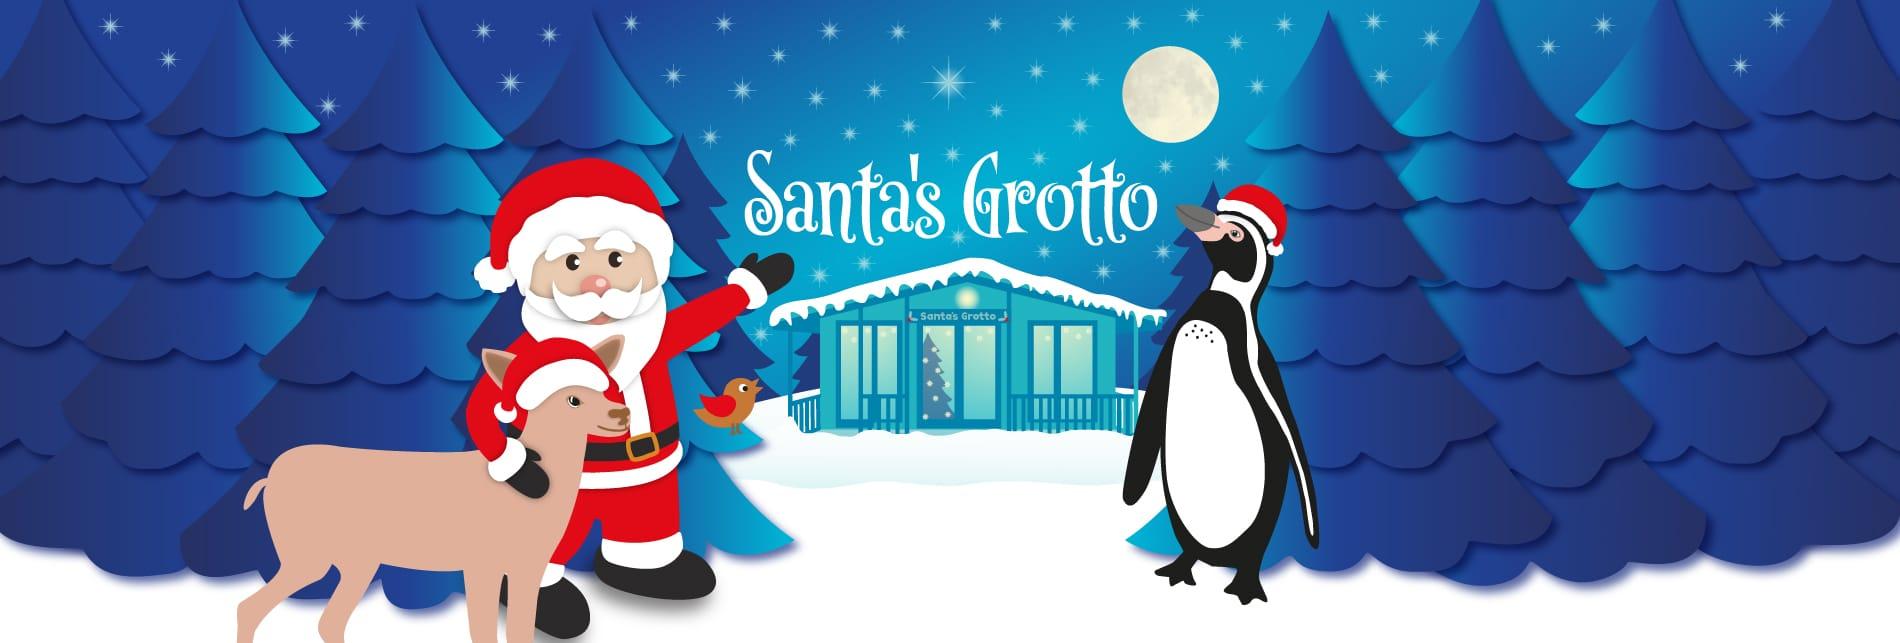 newquay zoo santas grotto event